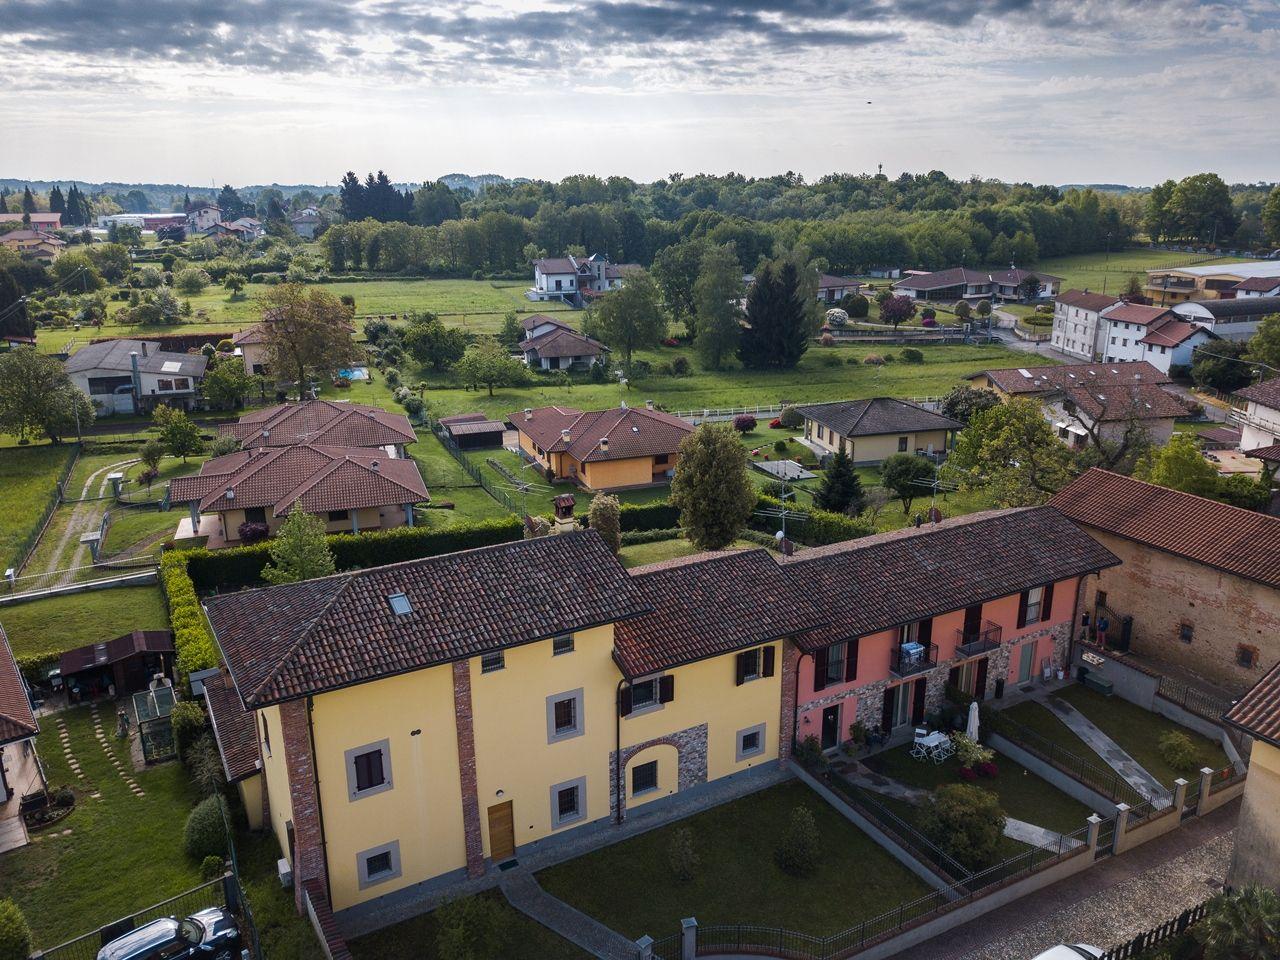 vista aerea - posteriore - villa - giardino